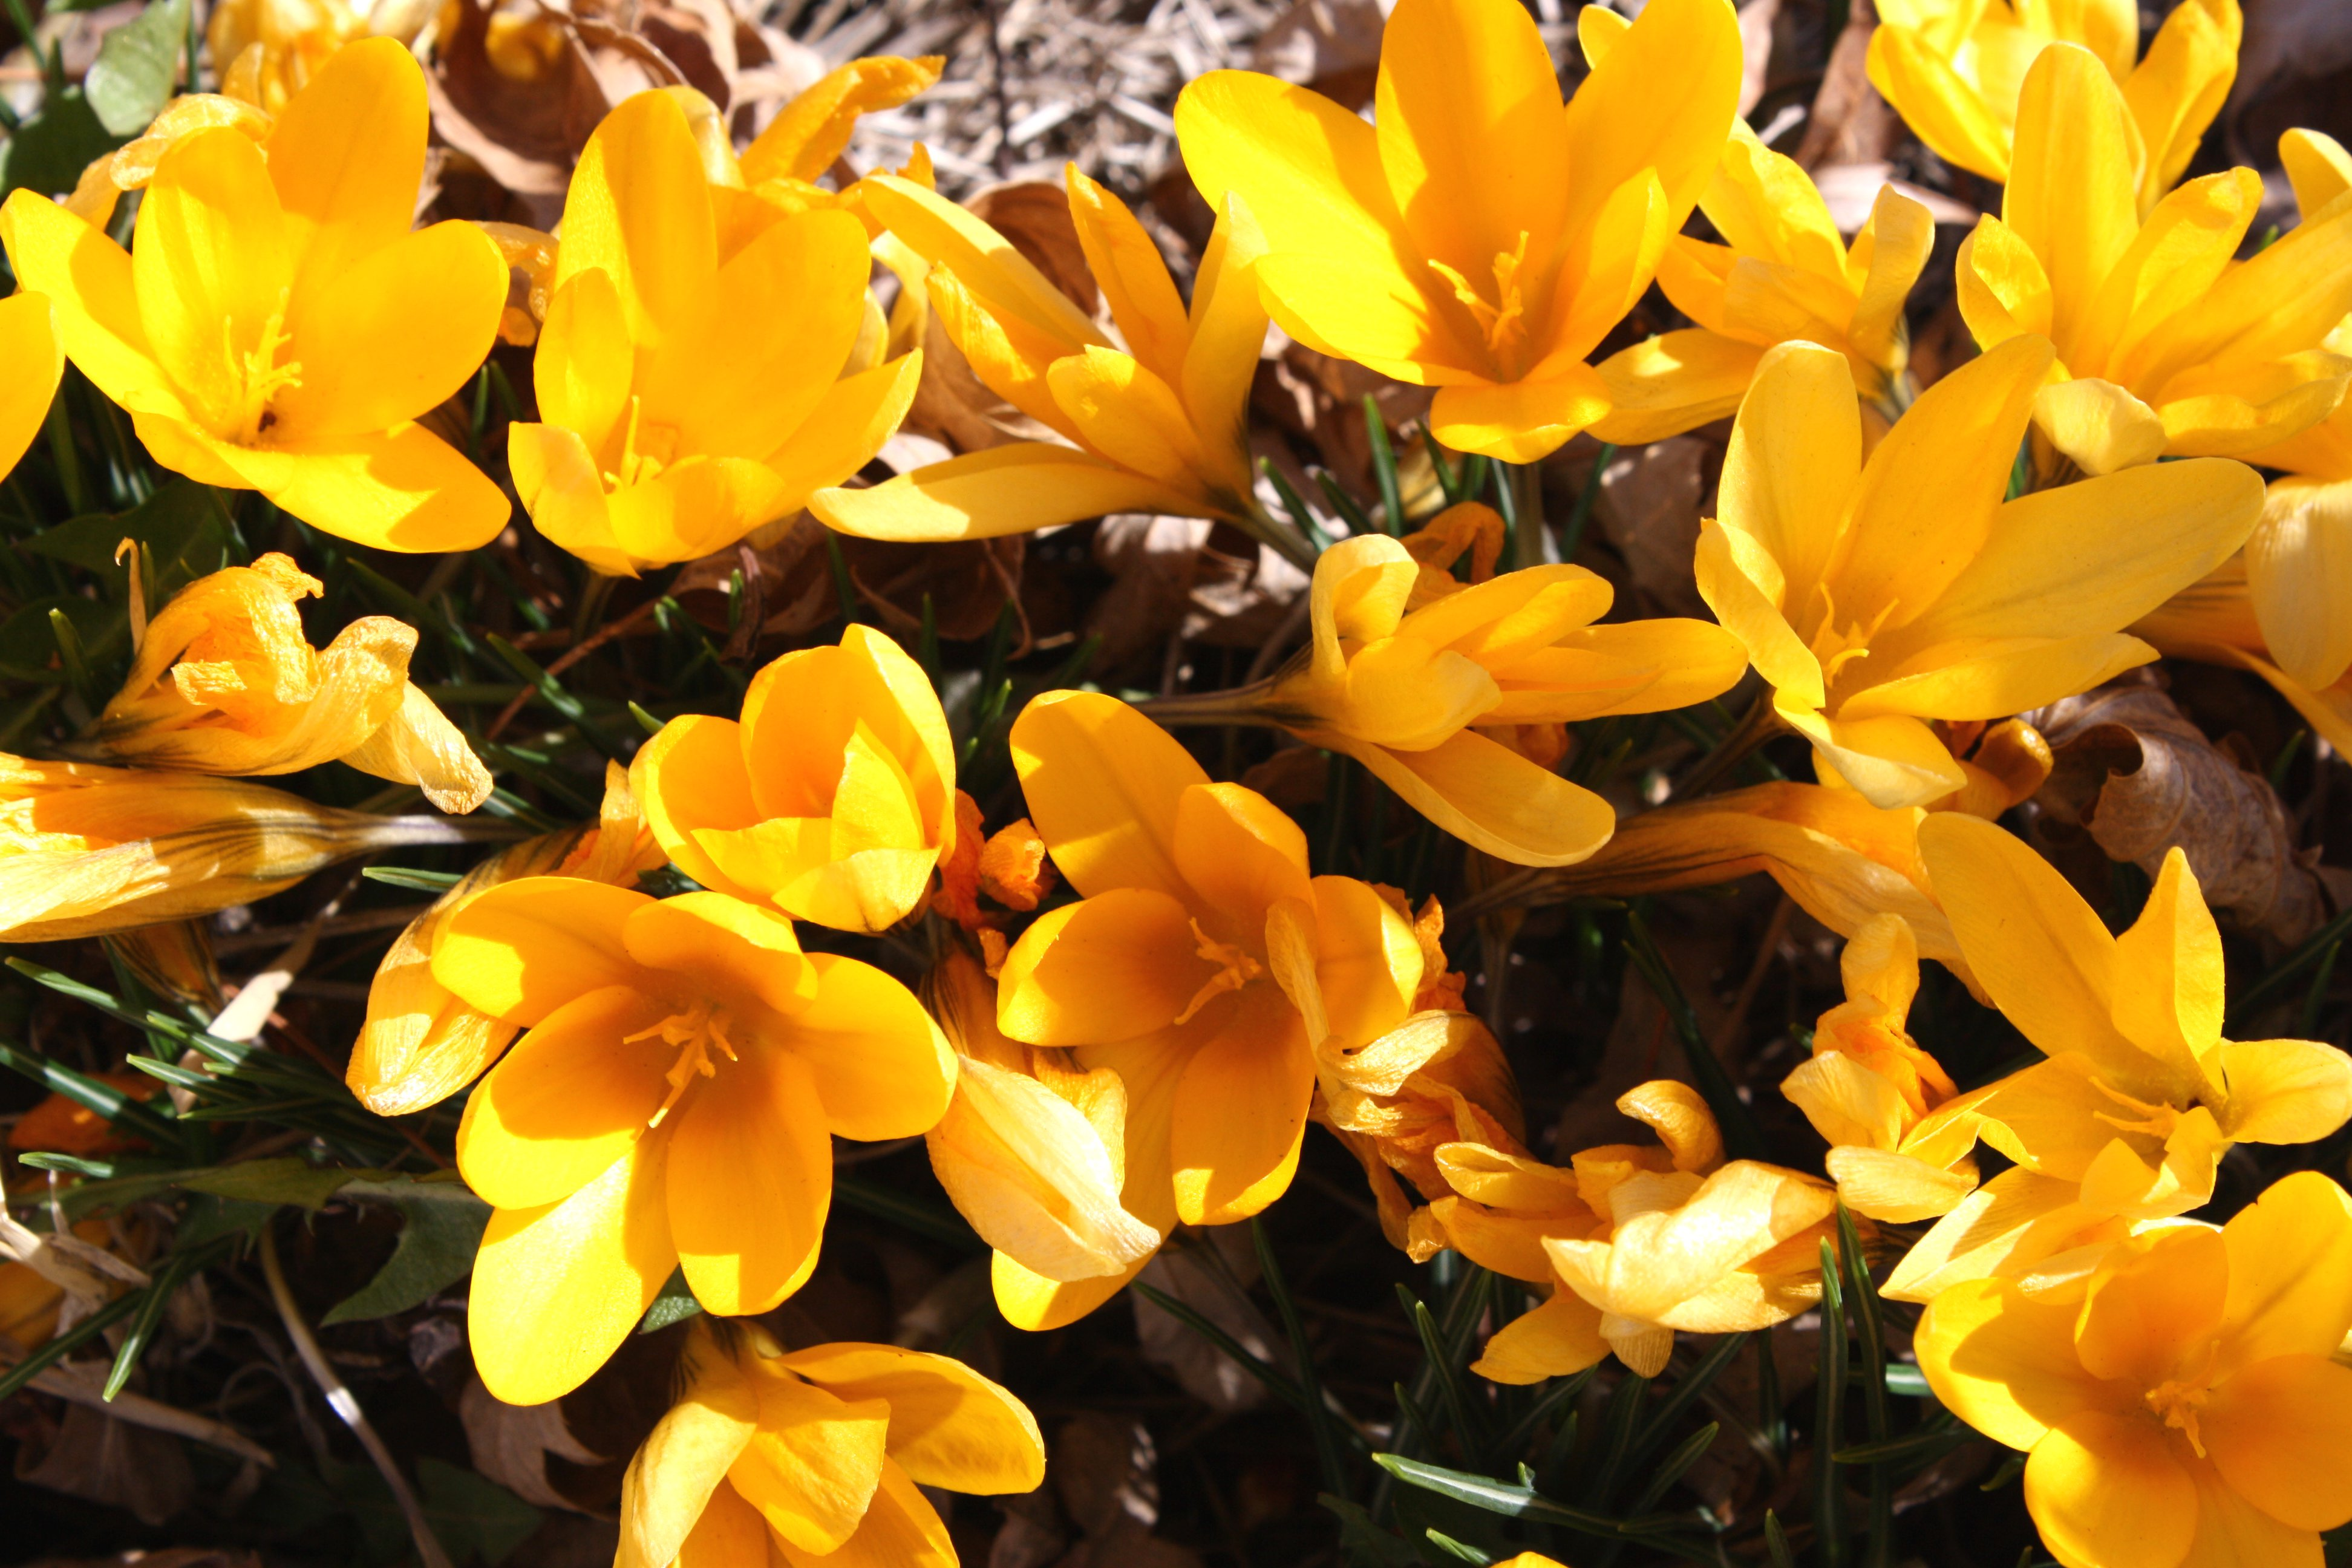 Yellow Crocus Flowers Photos Public Domain